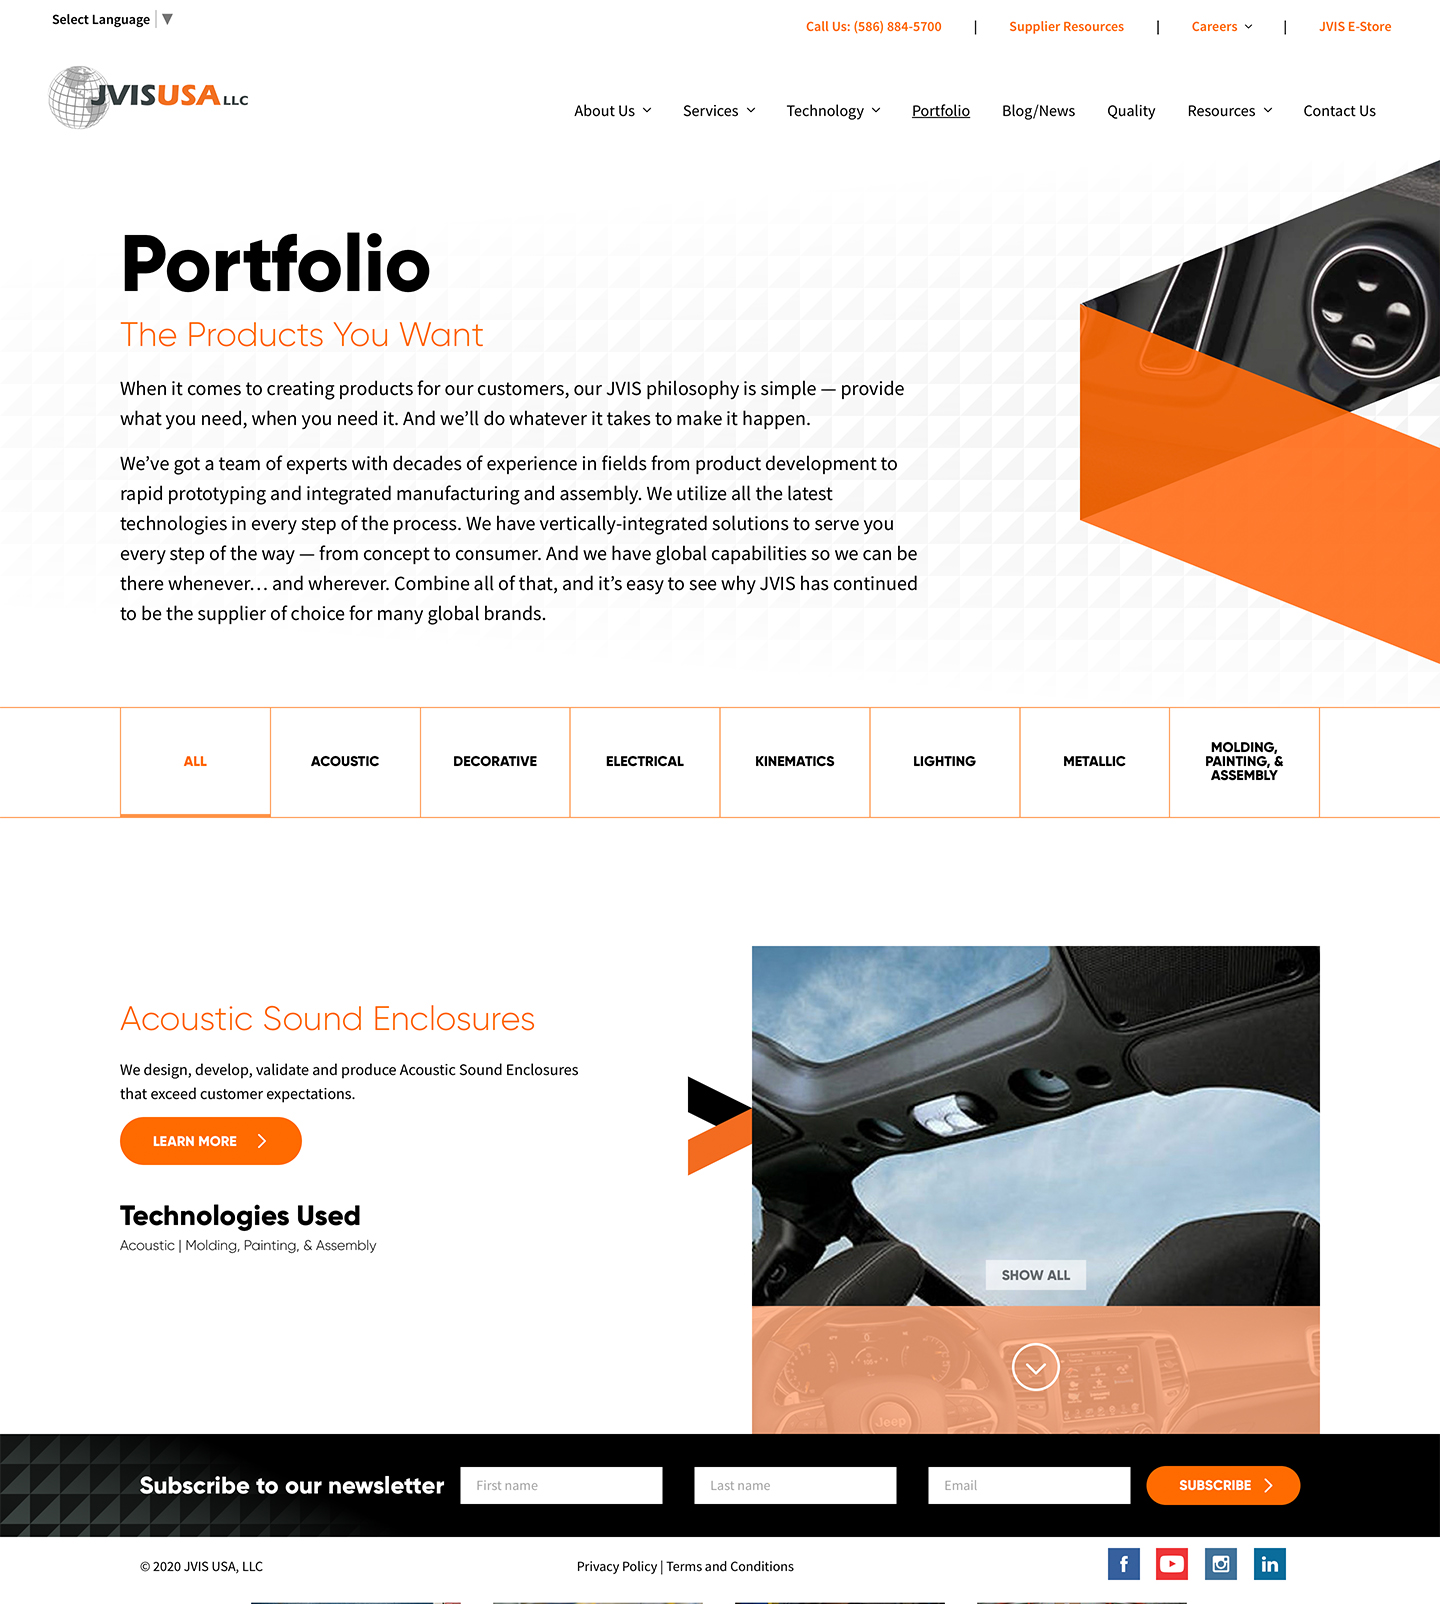 Global Supply Chain Website Design